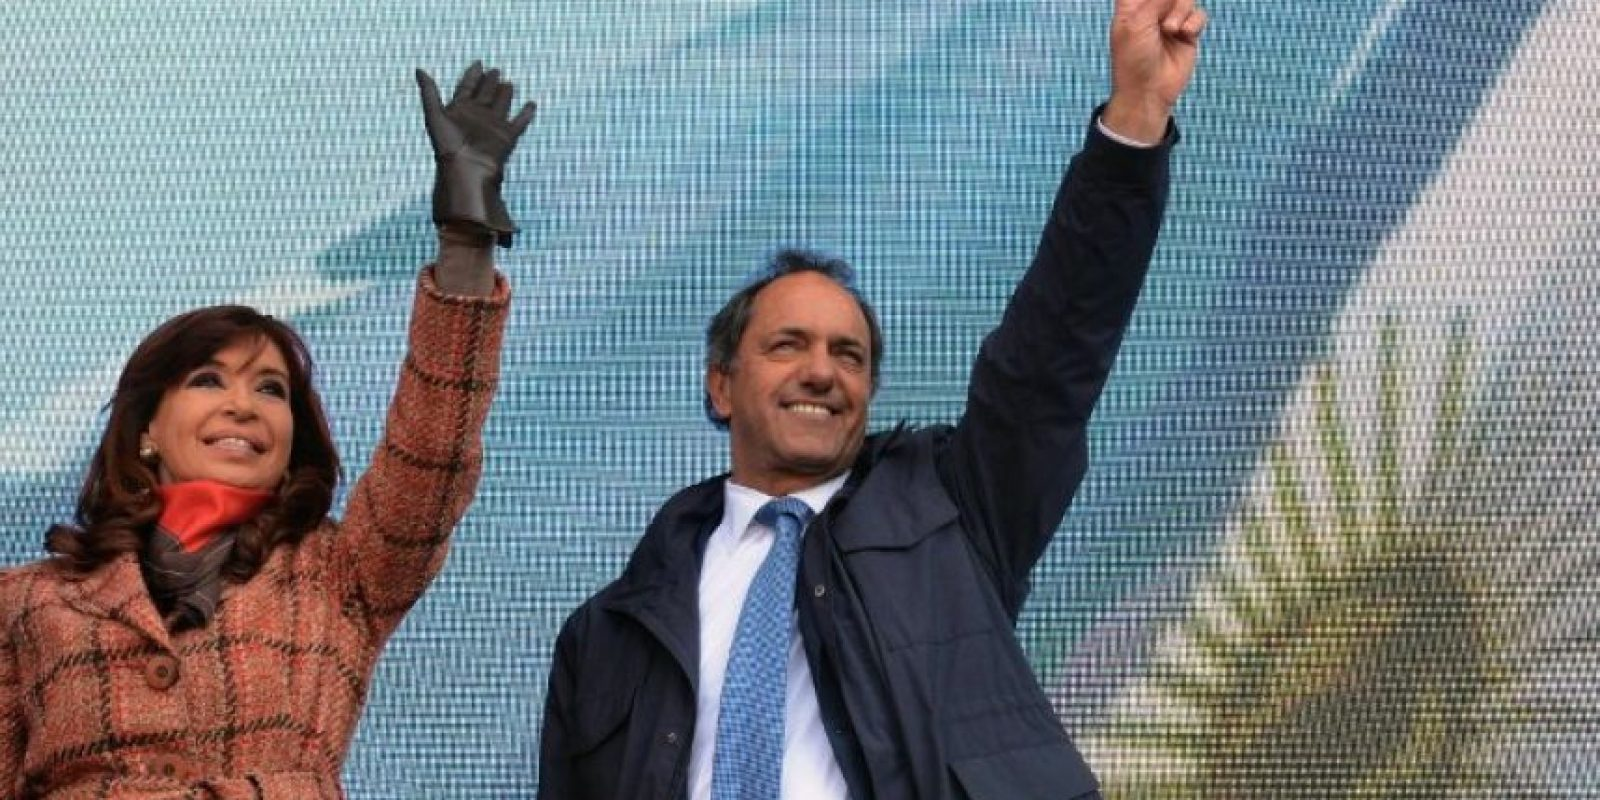 Fue vicepresidente en el mandato de Néstor Kirchner (2003-2007) Foto:AFP